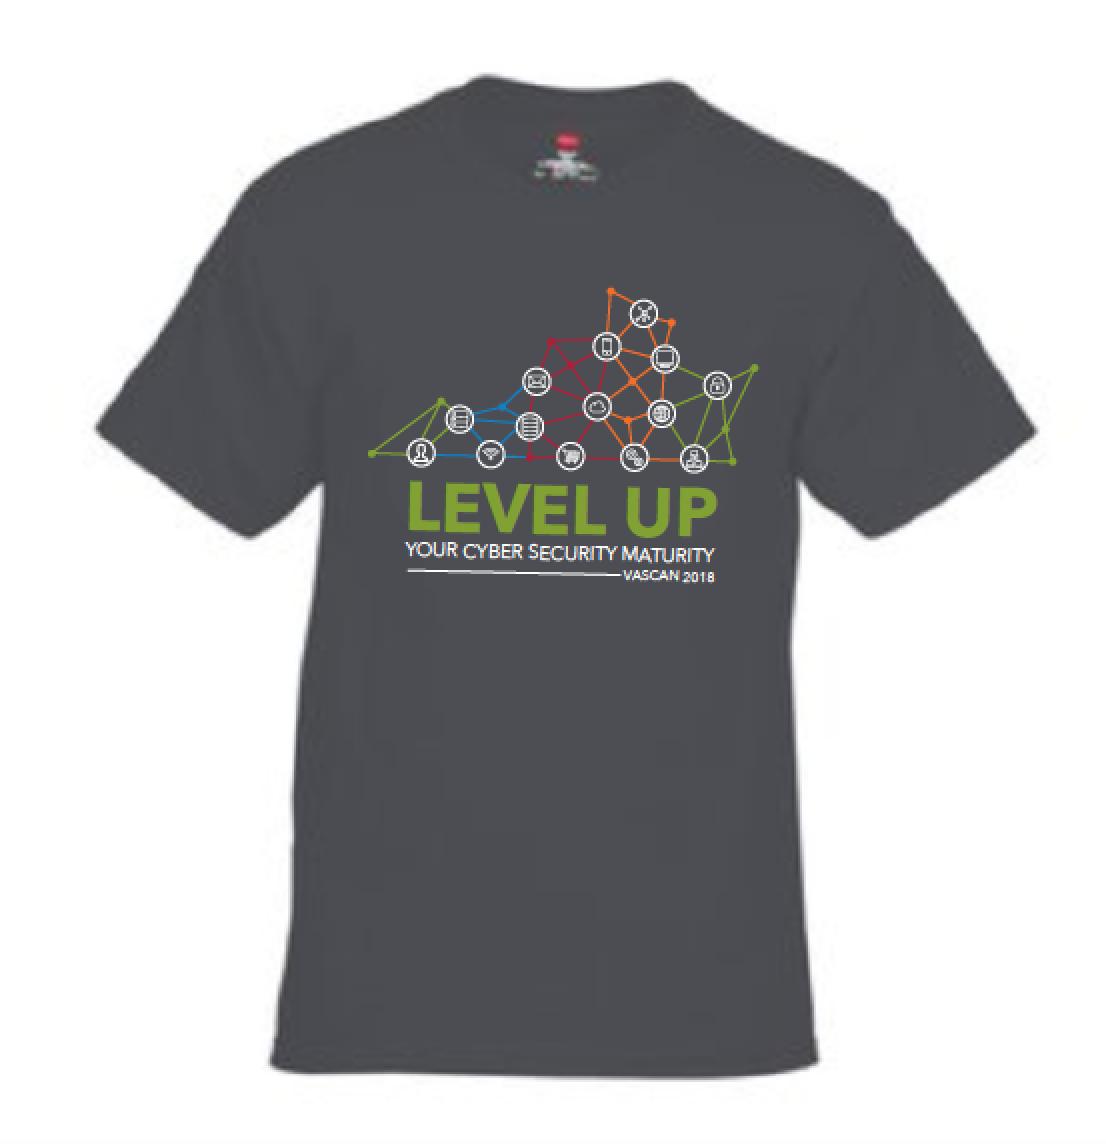 VASCAN Conference T-shirt